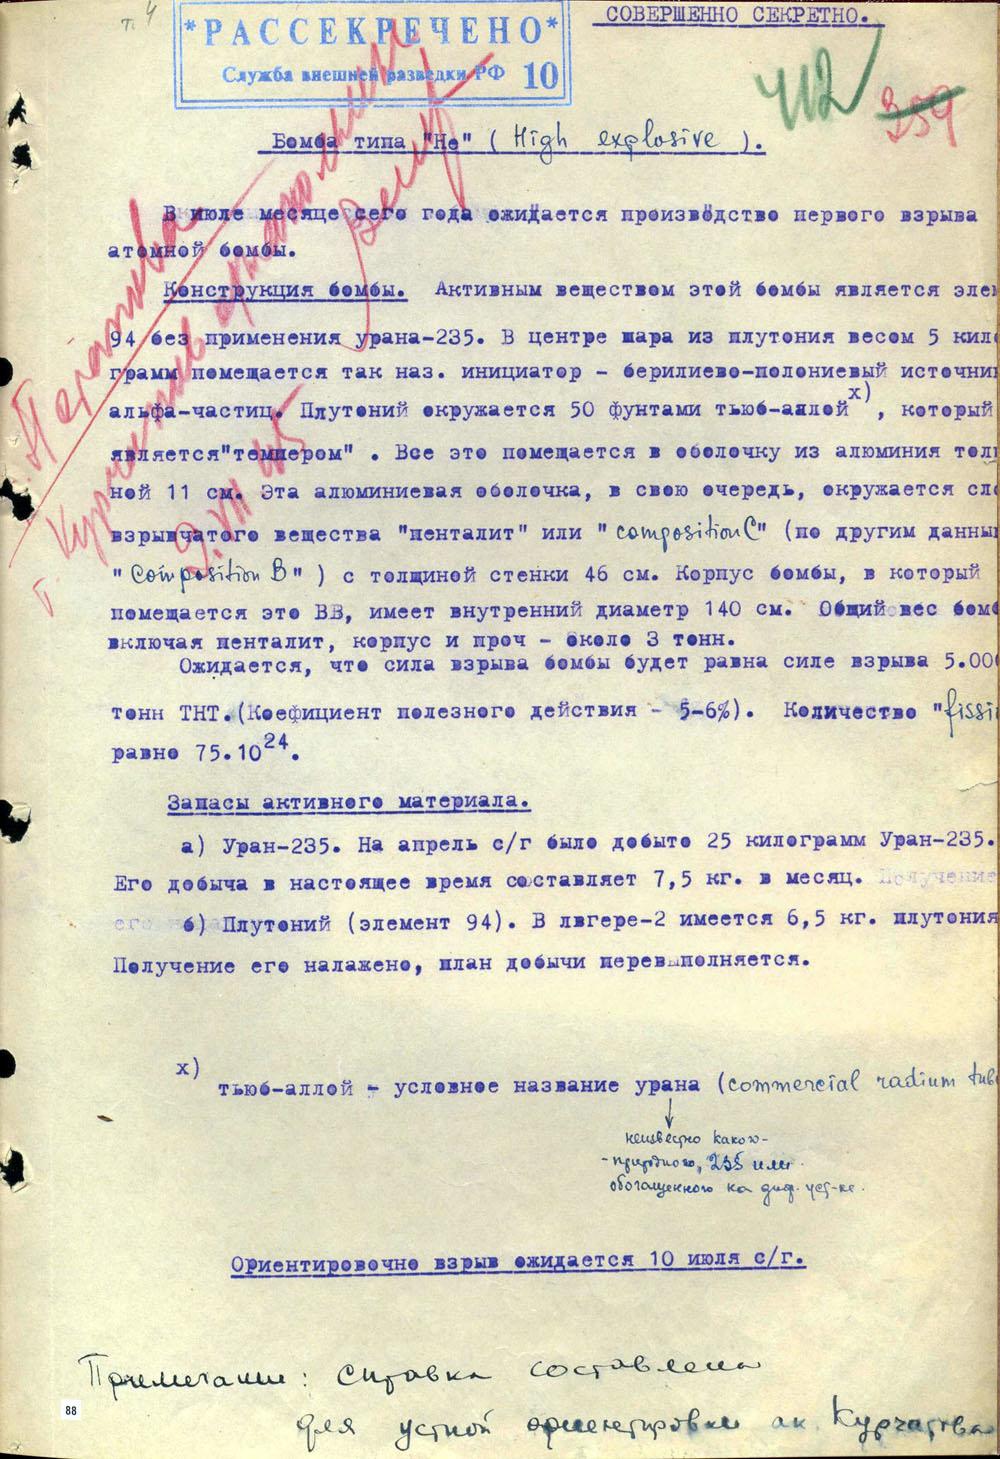 Beria-letter-on-US-atomic-bomb-work-Feb-1945